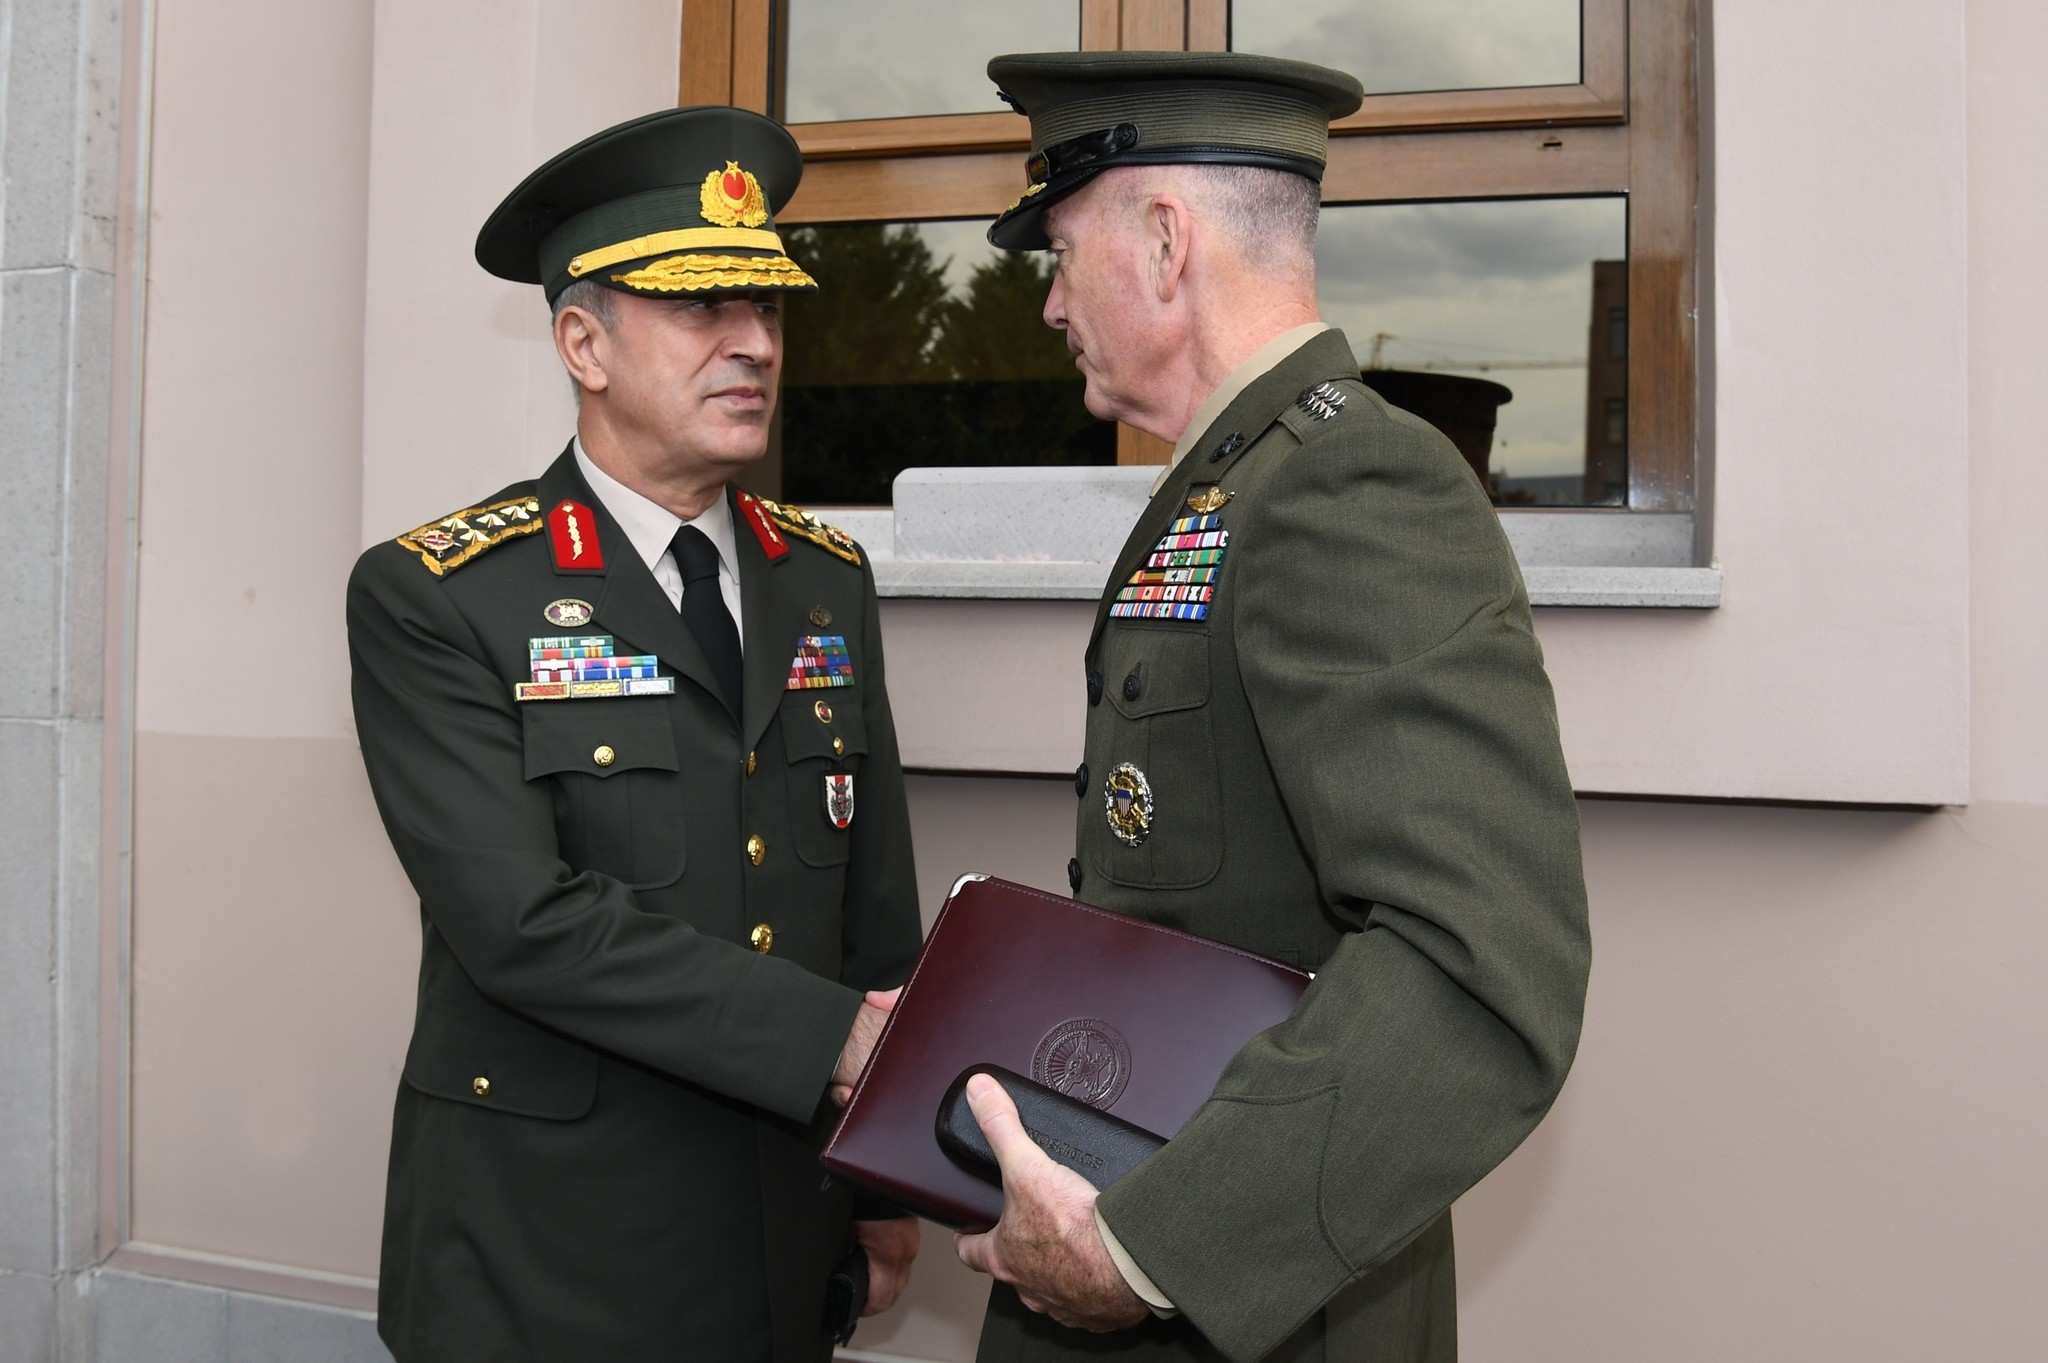 Army Gen. Hulusi Akar met with the Chairman of the U.S. Joint Chiefs of Staff Gen. Joseph Dunford in Ankara on Nov. 6, 2016. (IHA Photo)